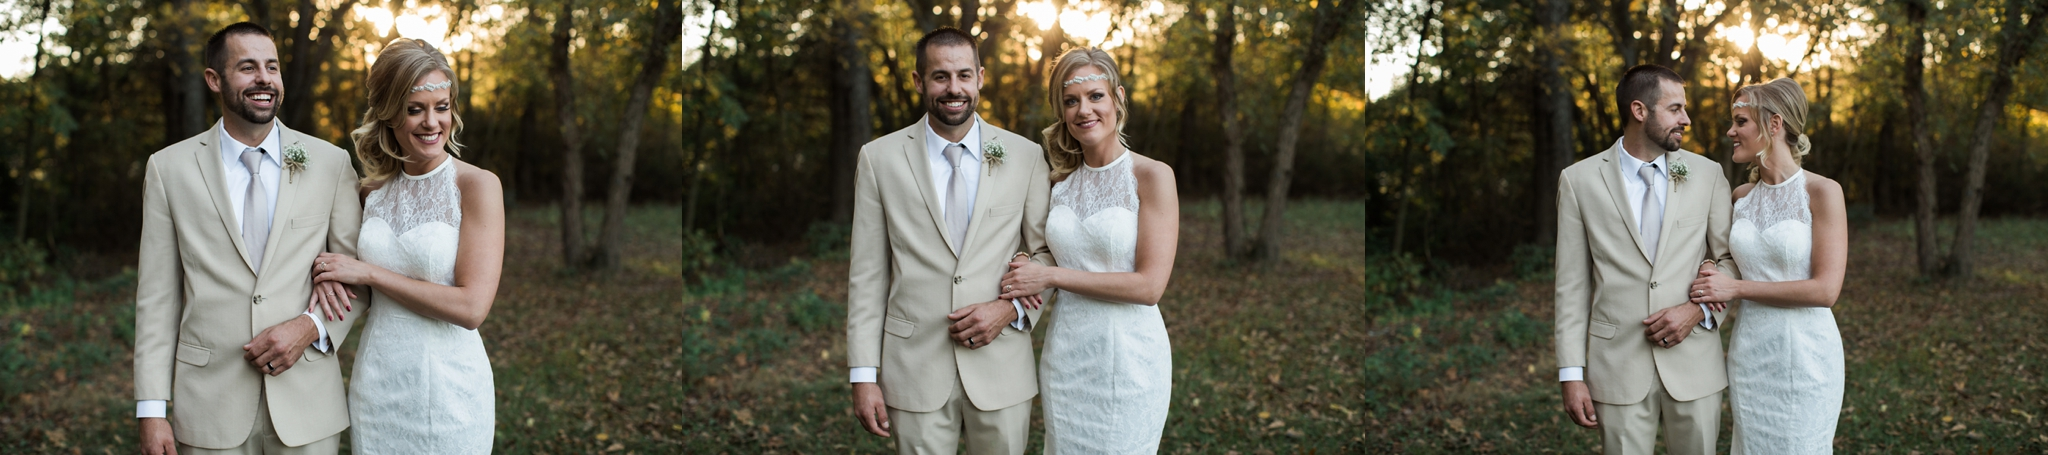 St Louis Wedding Photographer_0722.jpg